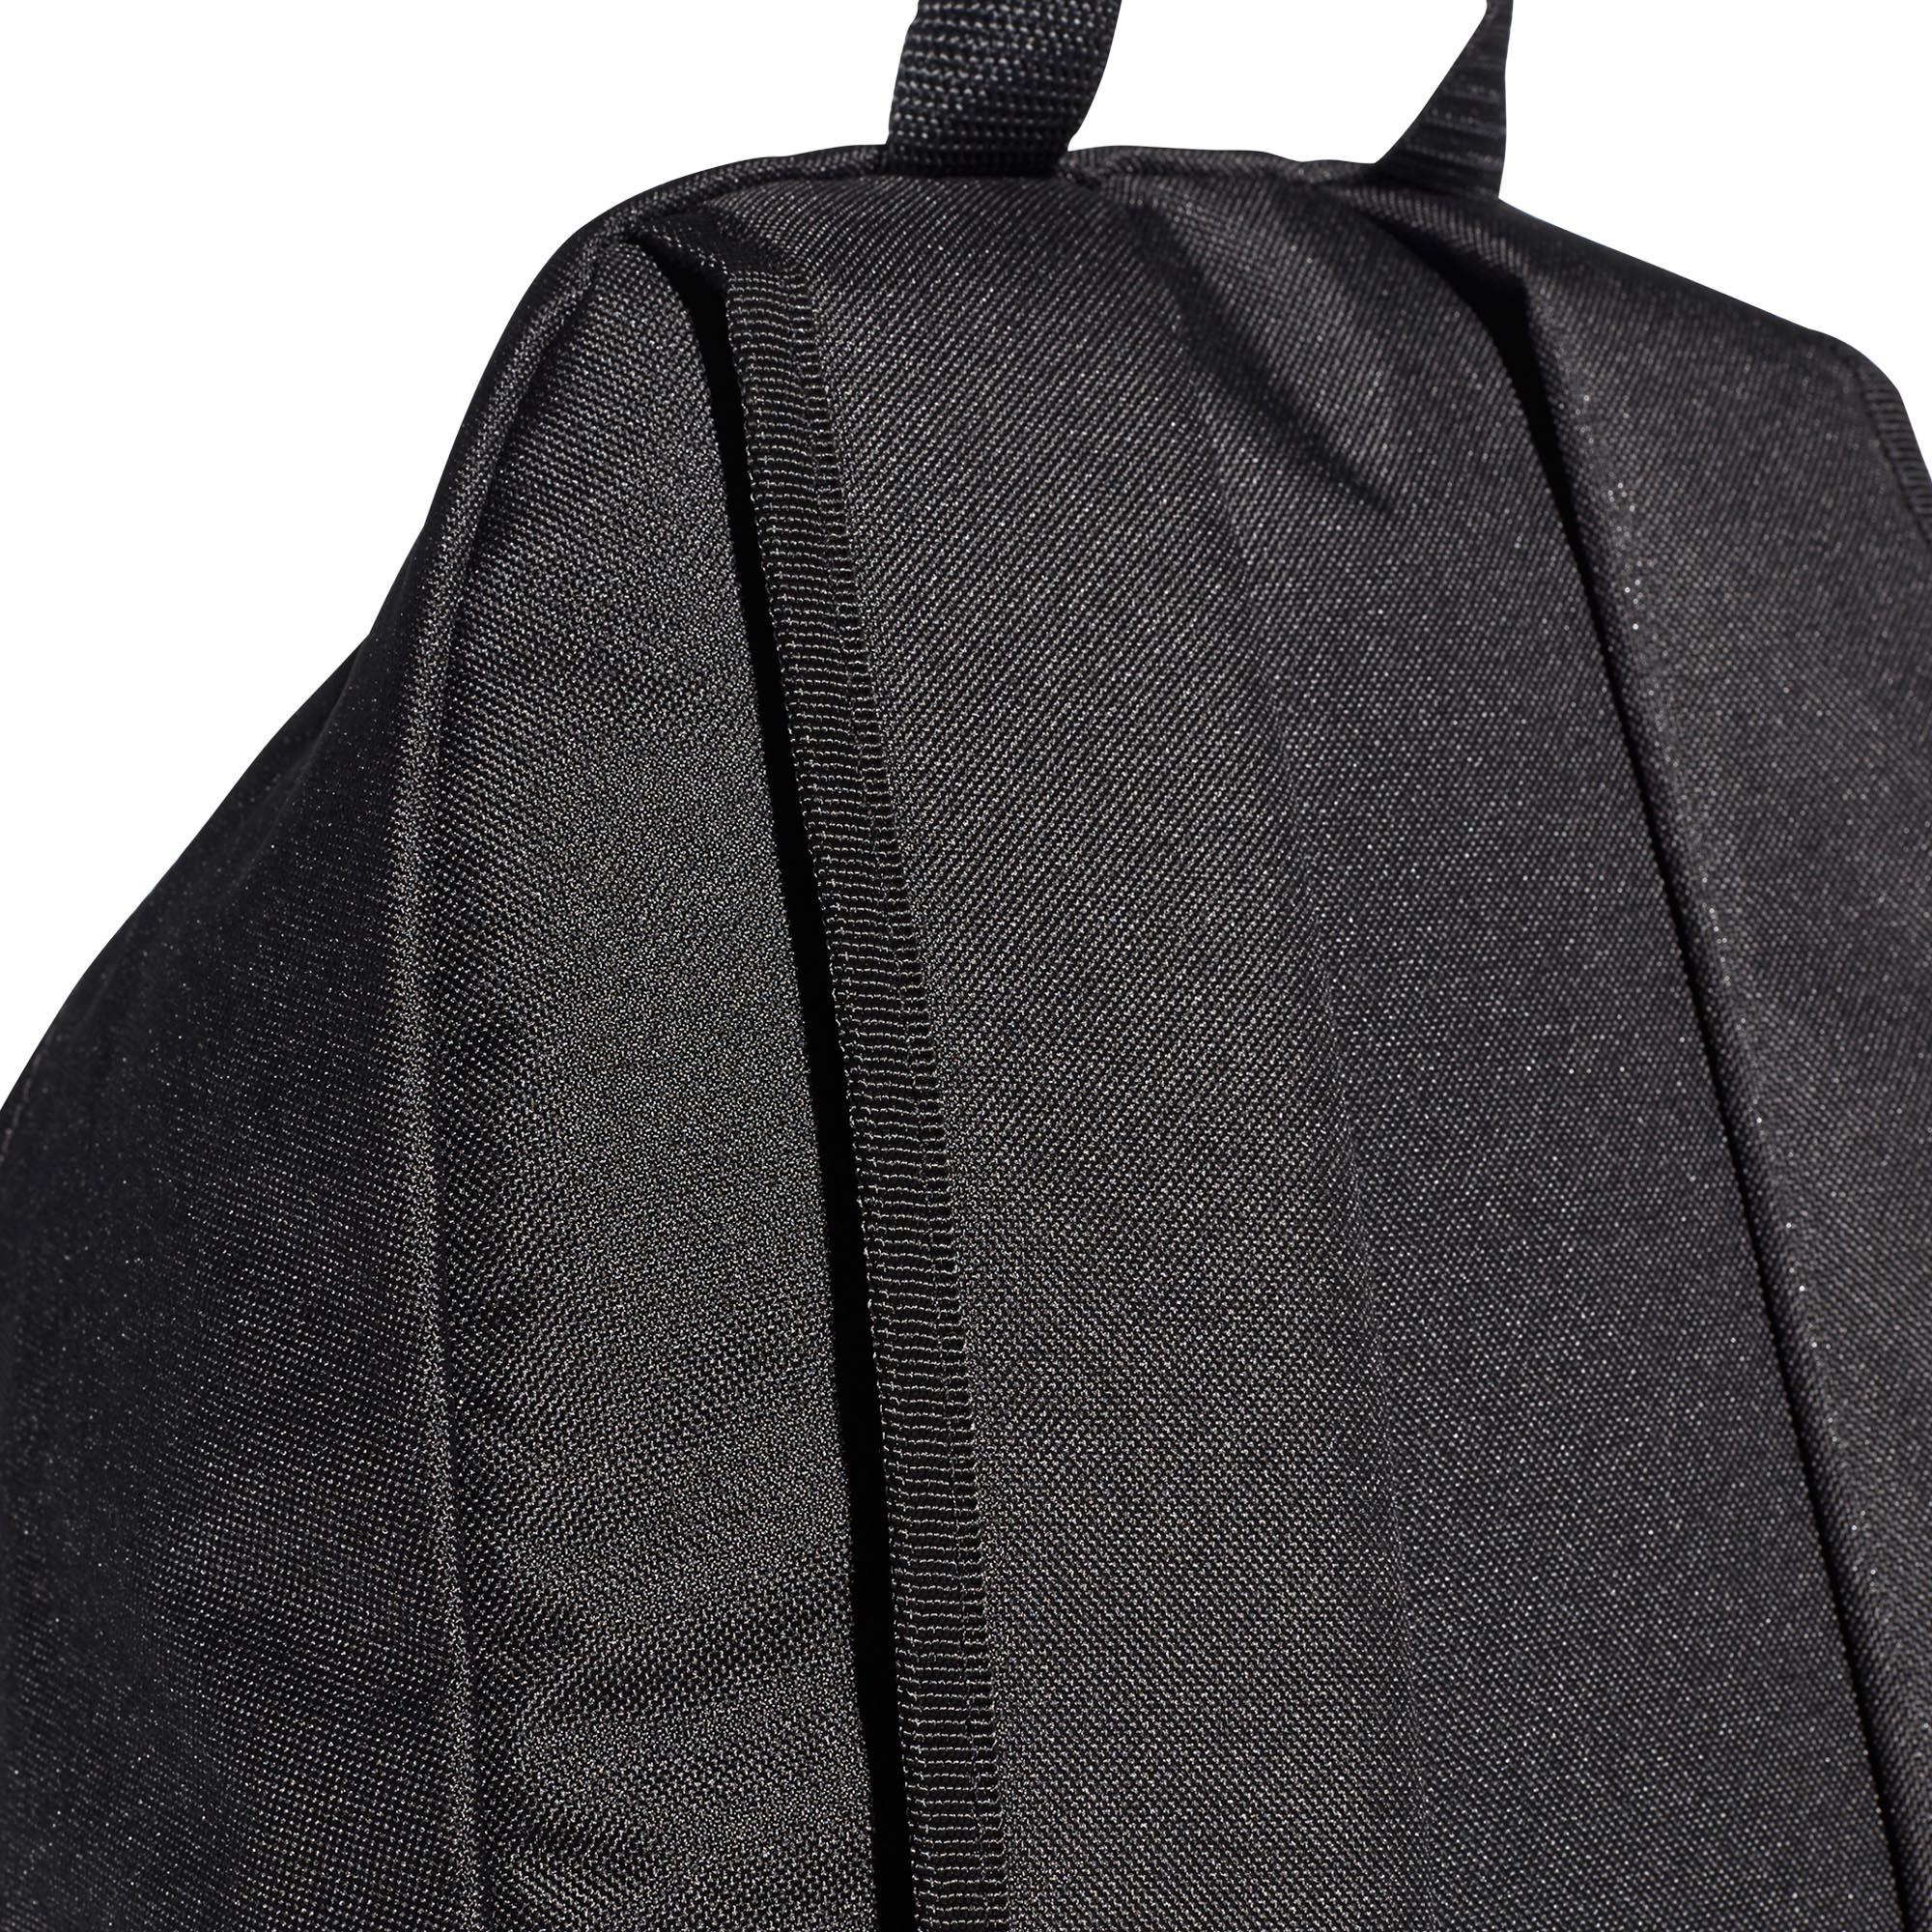 713a97ff6 adidas Linear Core Backpack Rucksack School Sports Bag Black/White ...